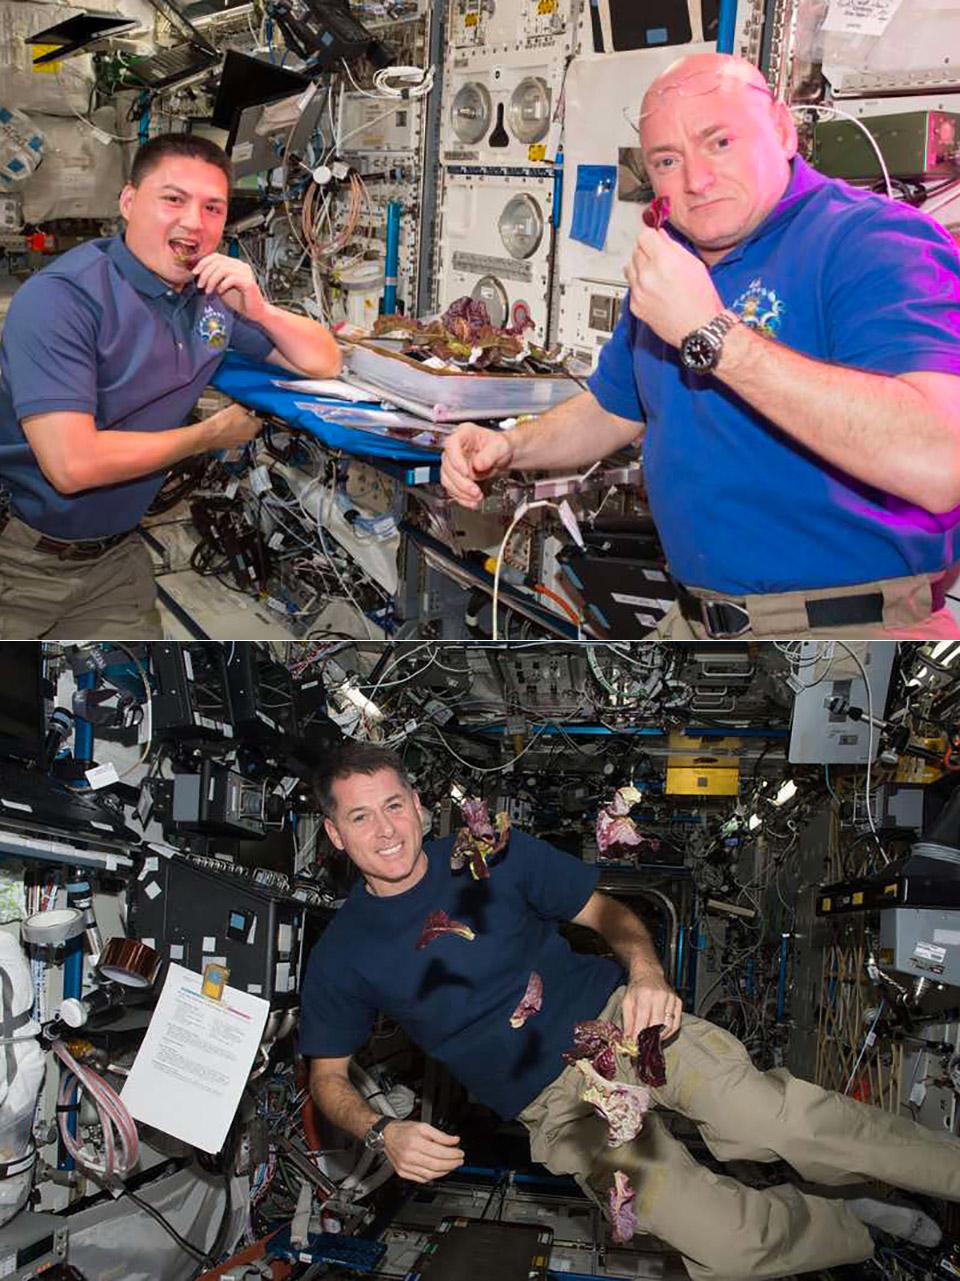 Space Station Lettuce